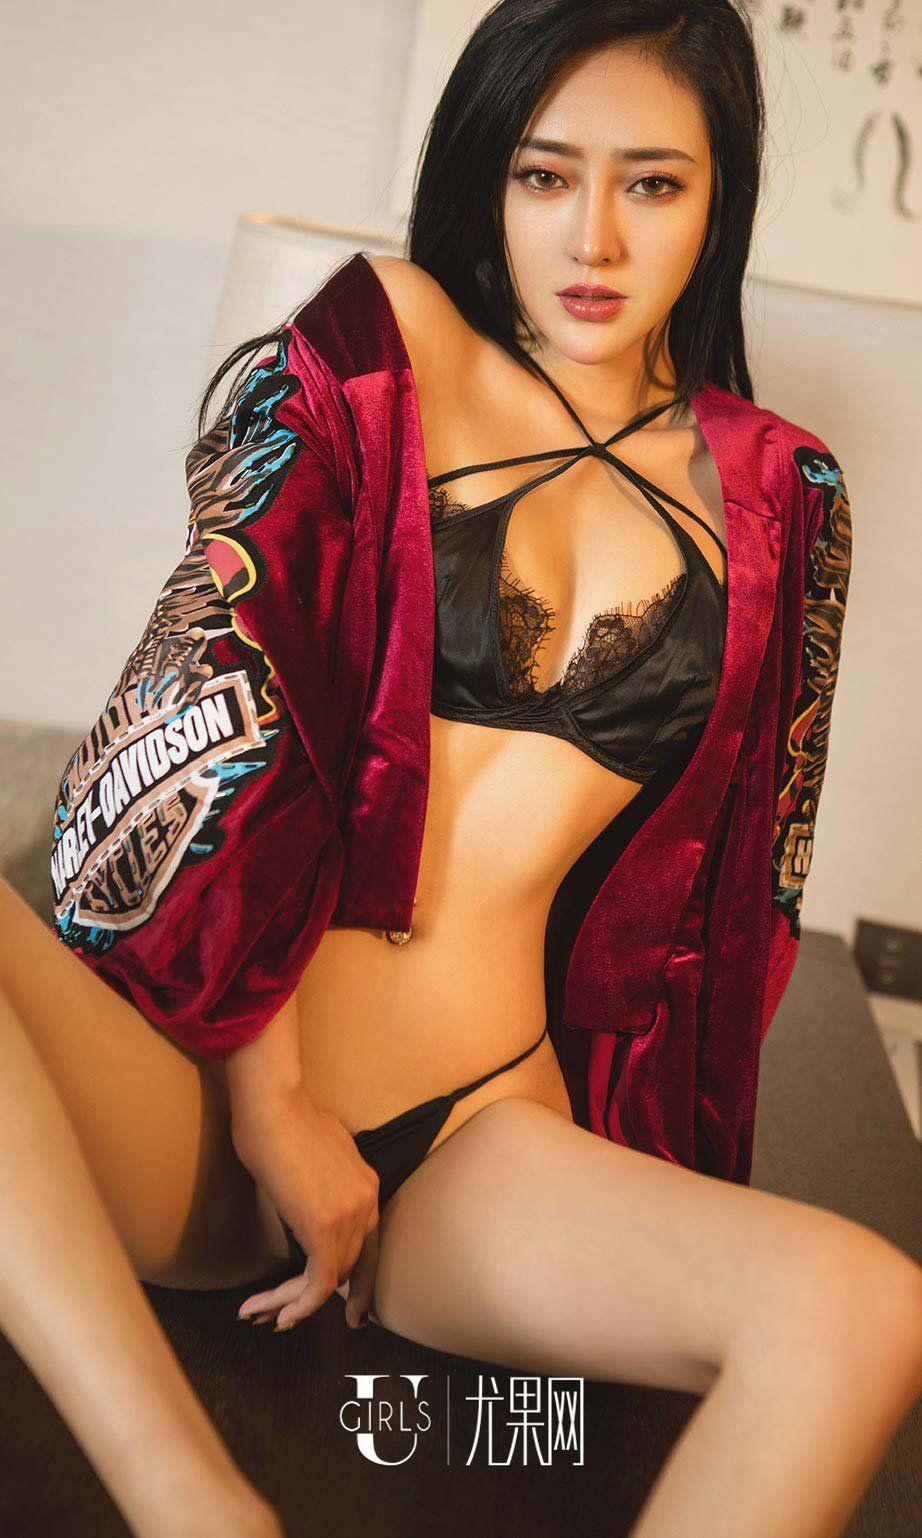 eba119c28c3 Wonder Woman · Black Underwear · Fantasy Characters · Cropped Tops ·  性感内衣美女Lucky诱惑私房照图片 Black Lingerie